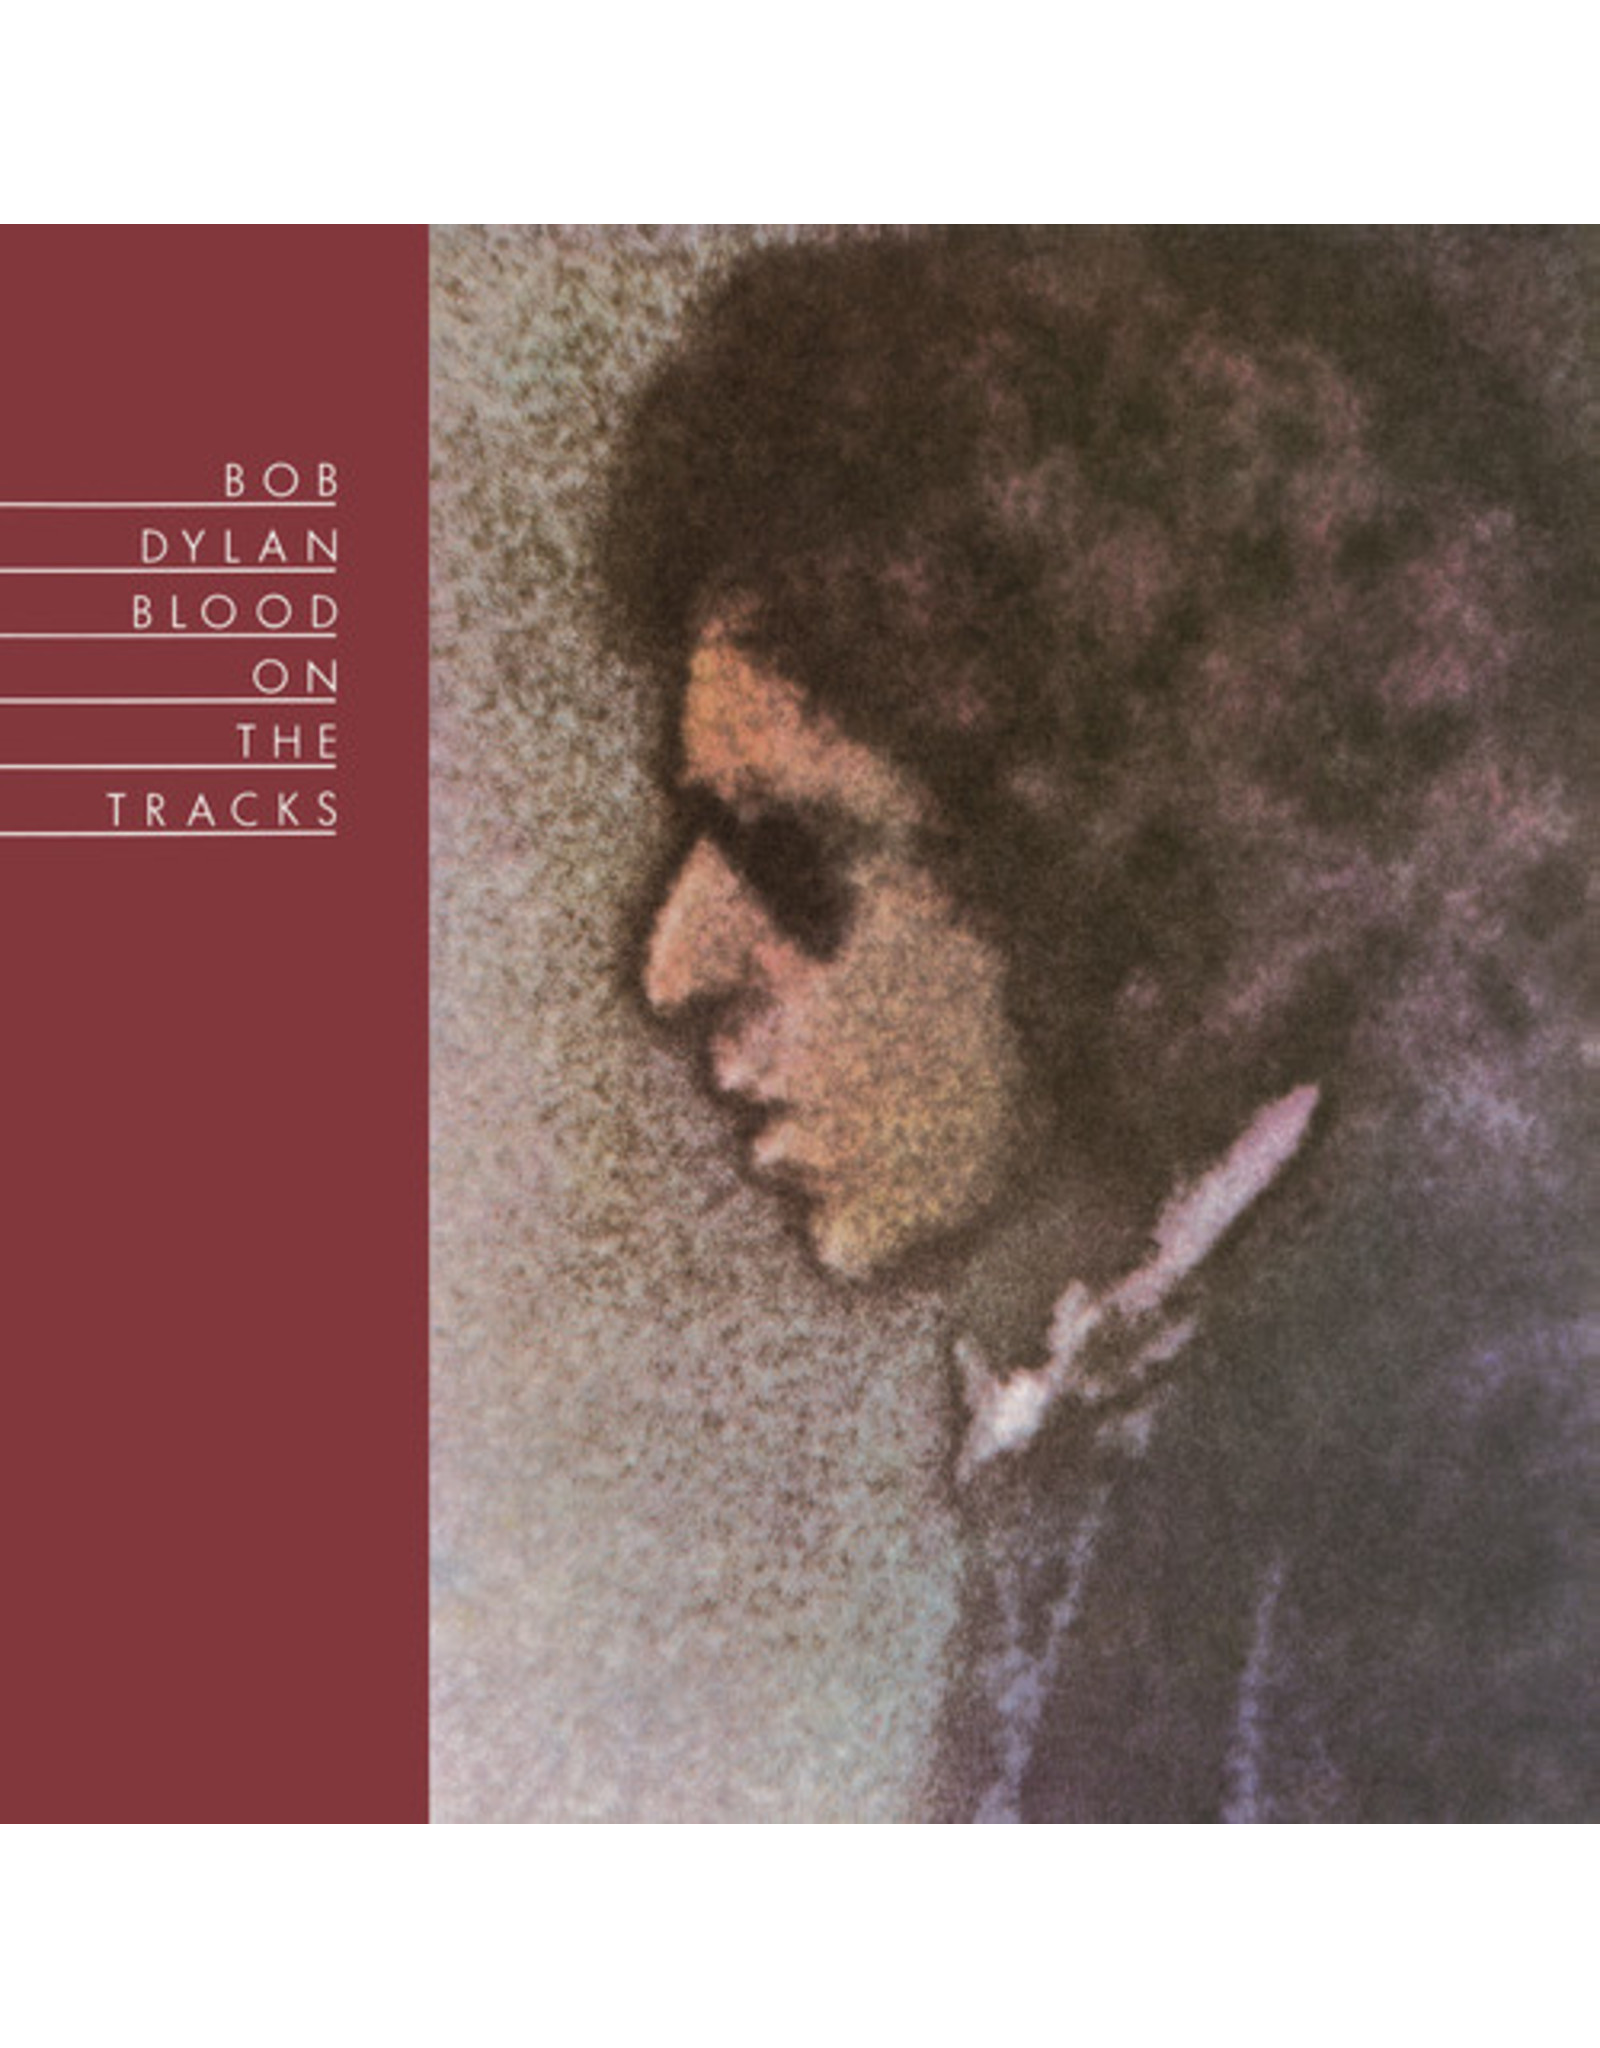 New Vinyl Bob Dylan - Blood On The Tracks LP